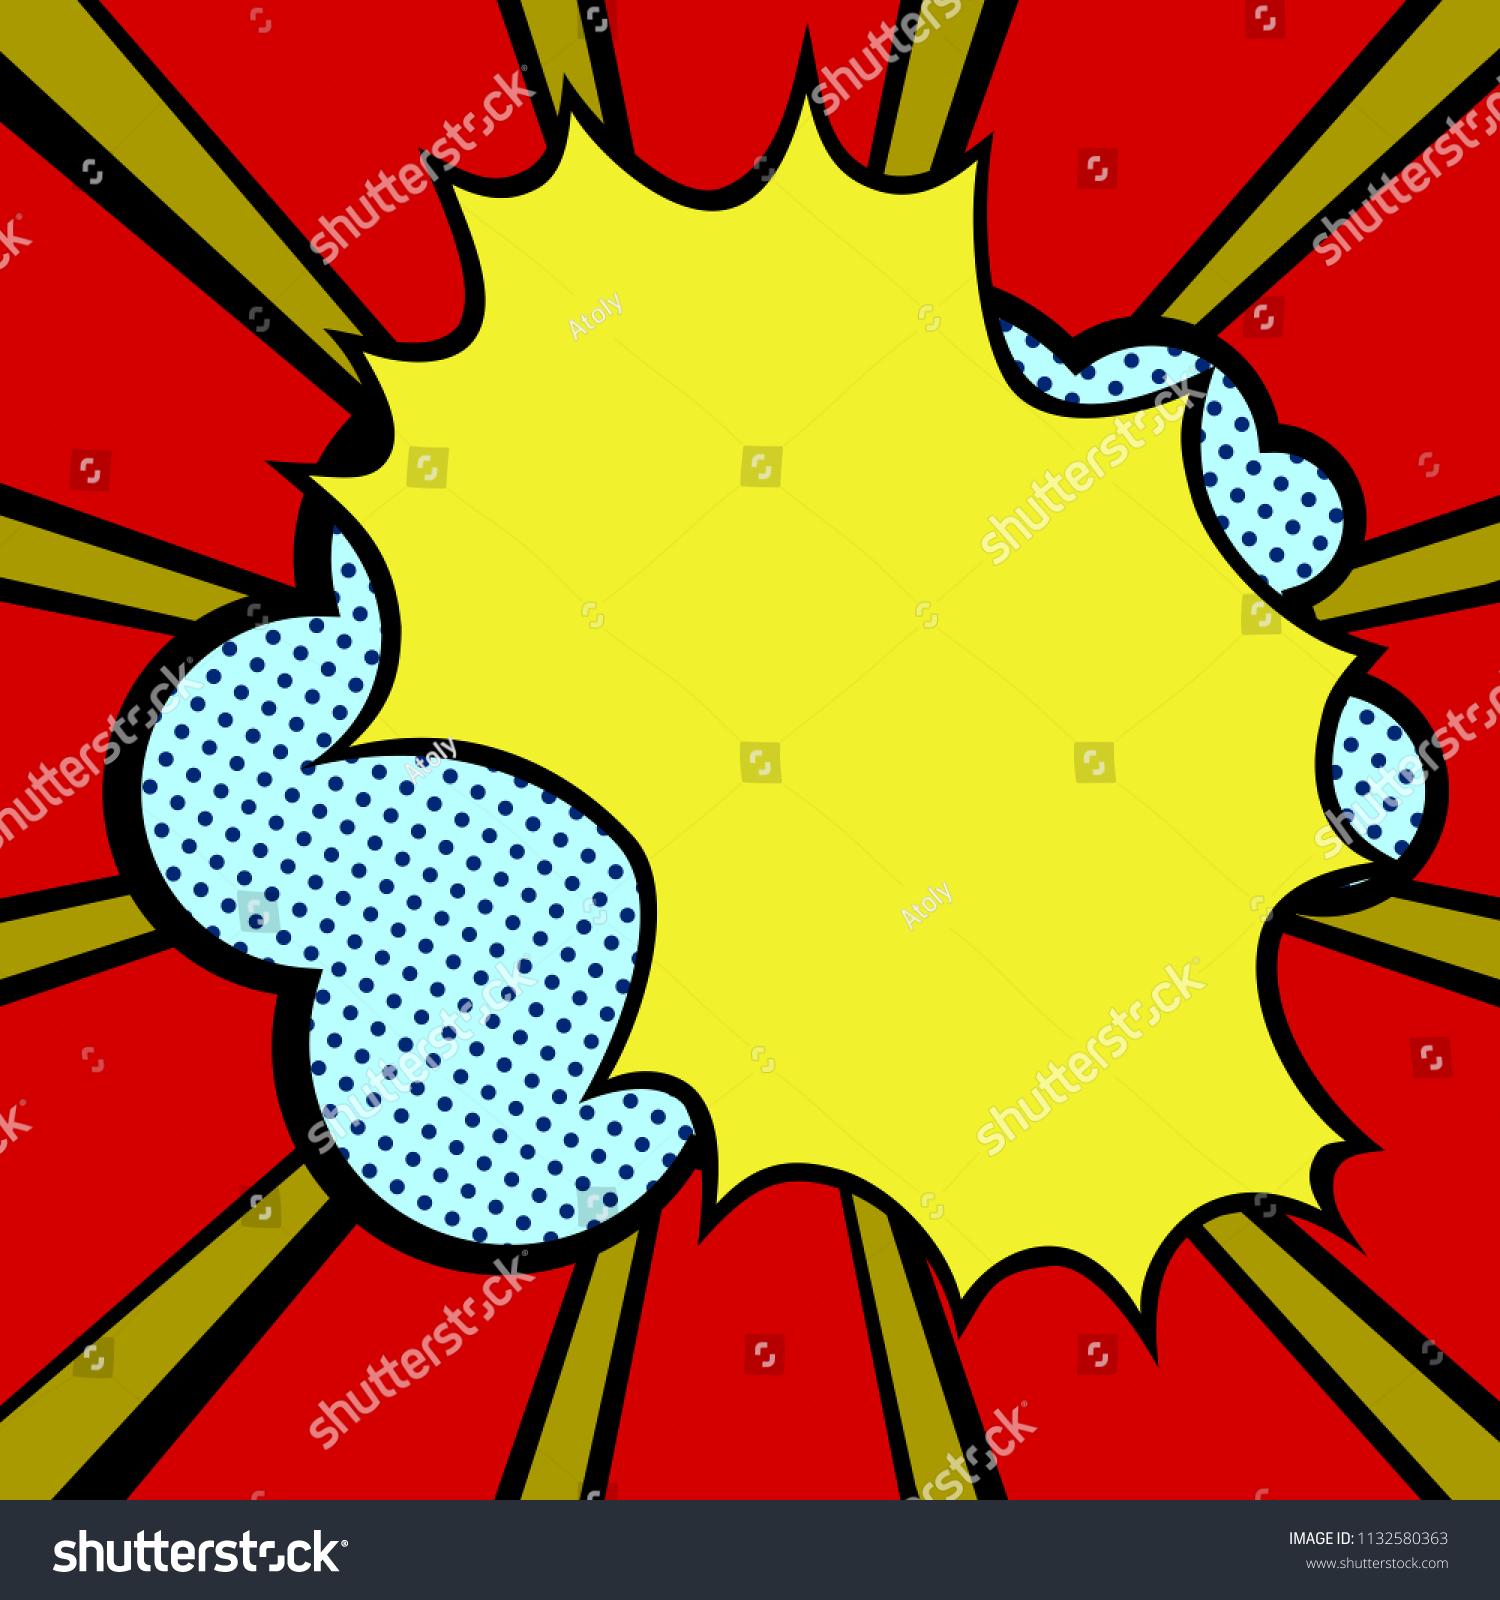 Contemporary Pop Art Wallpaper For Walls Vignette - Art u0026 Wall Decor .  sc 1 st  Art u0026 Wall Decor & Beautiful Pop Art Wallpaper For Walls Model - Art u0026 Wall Decor ...